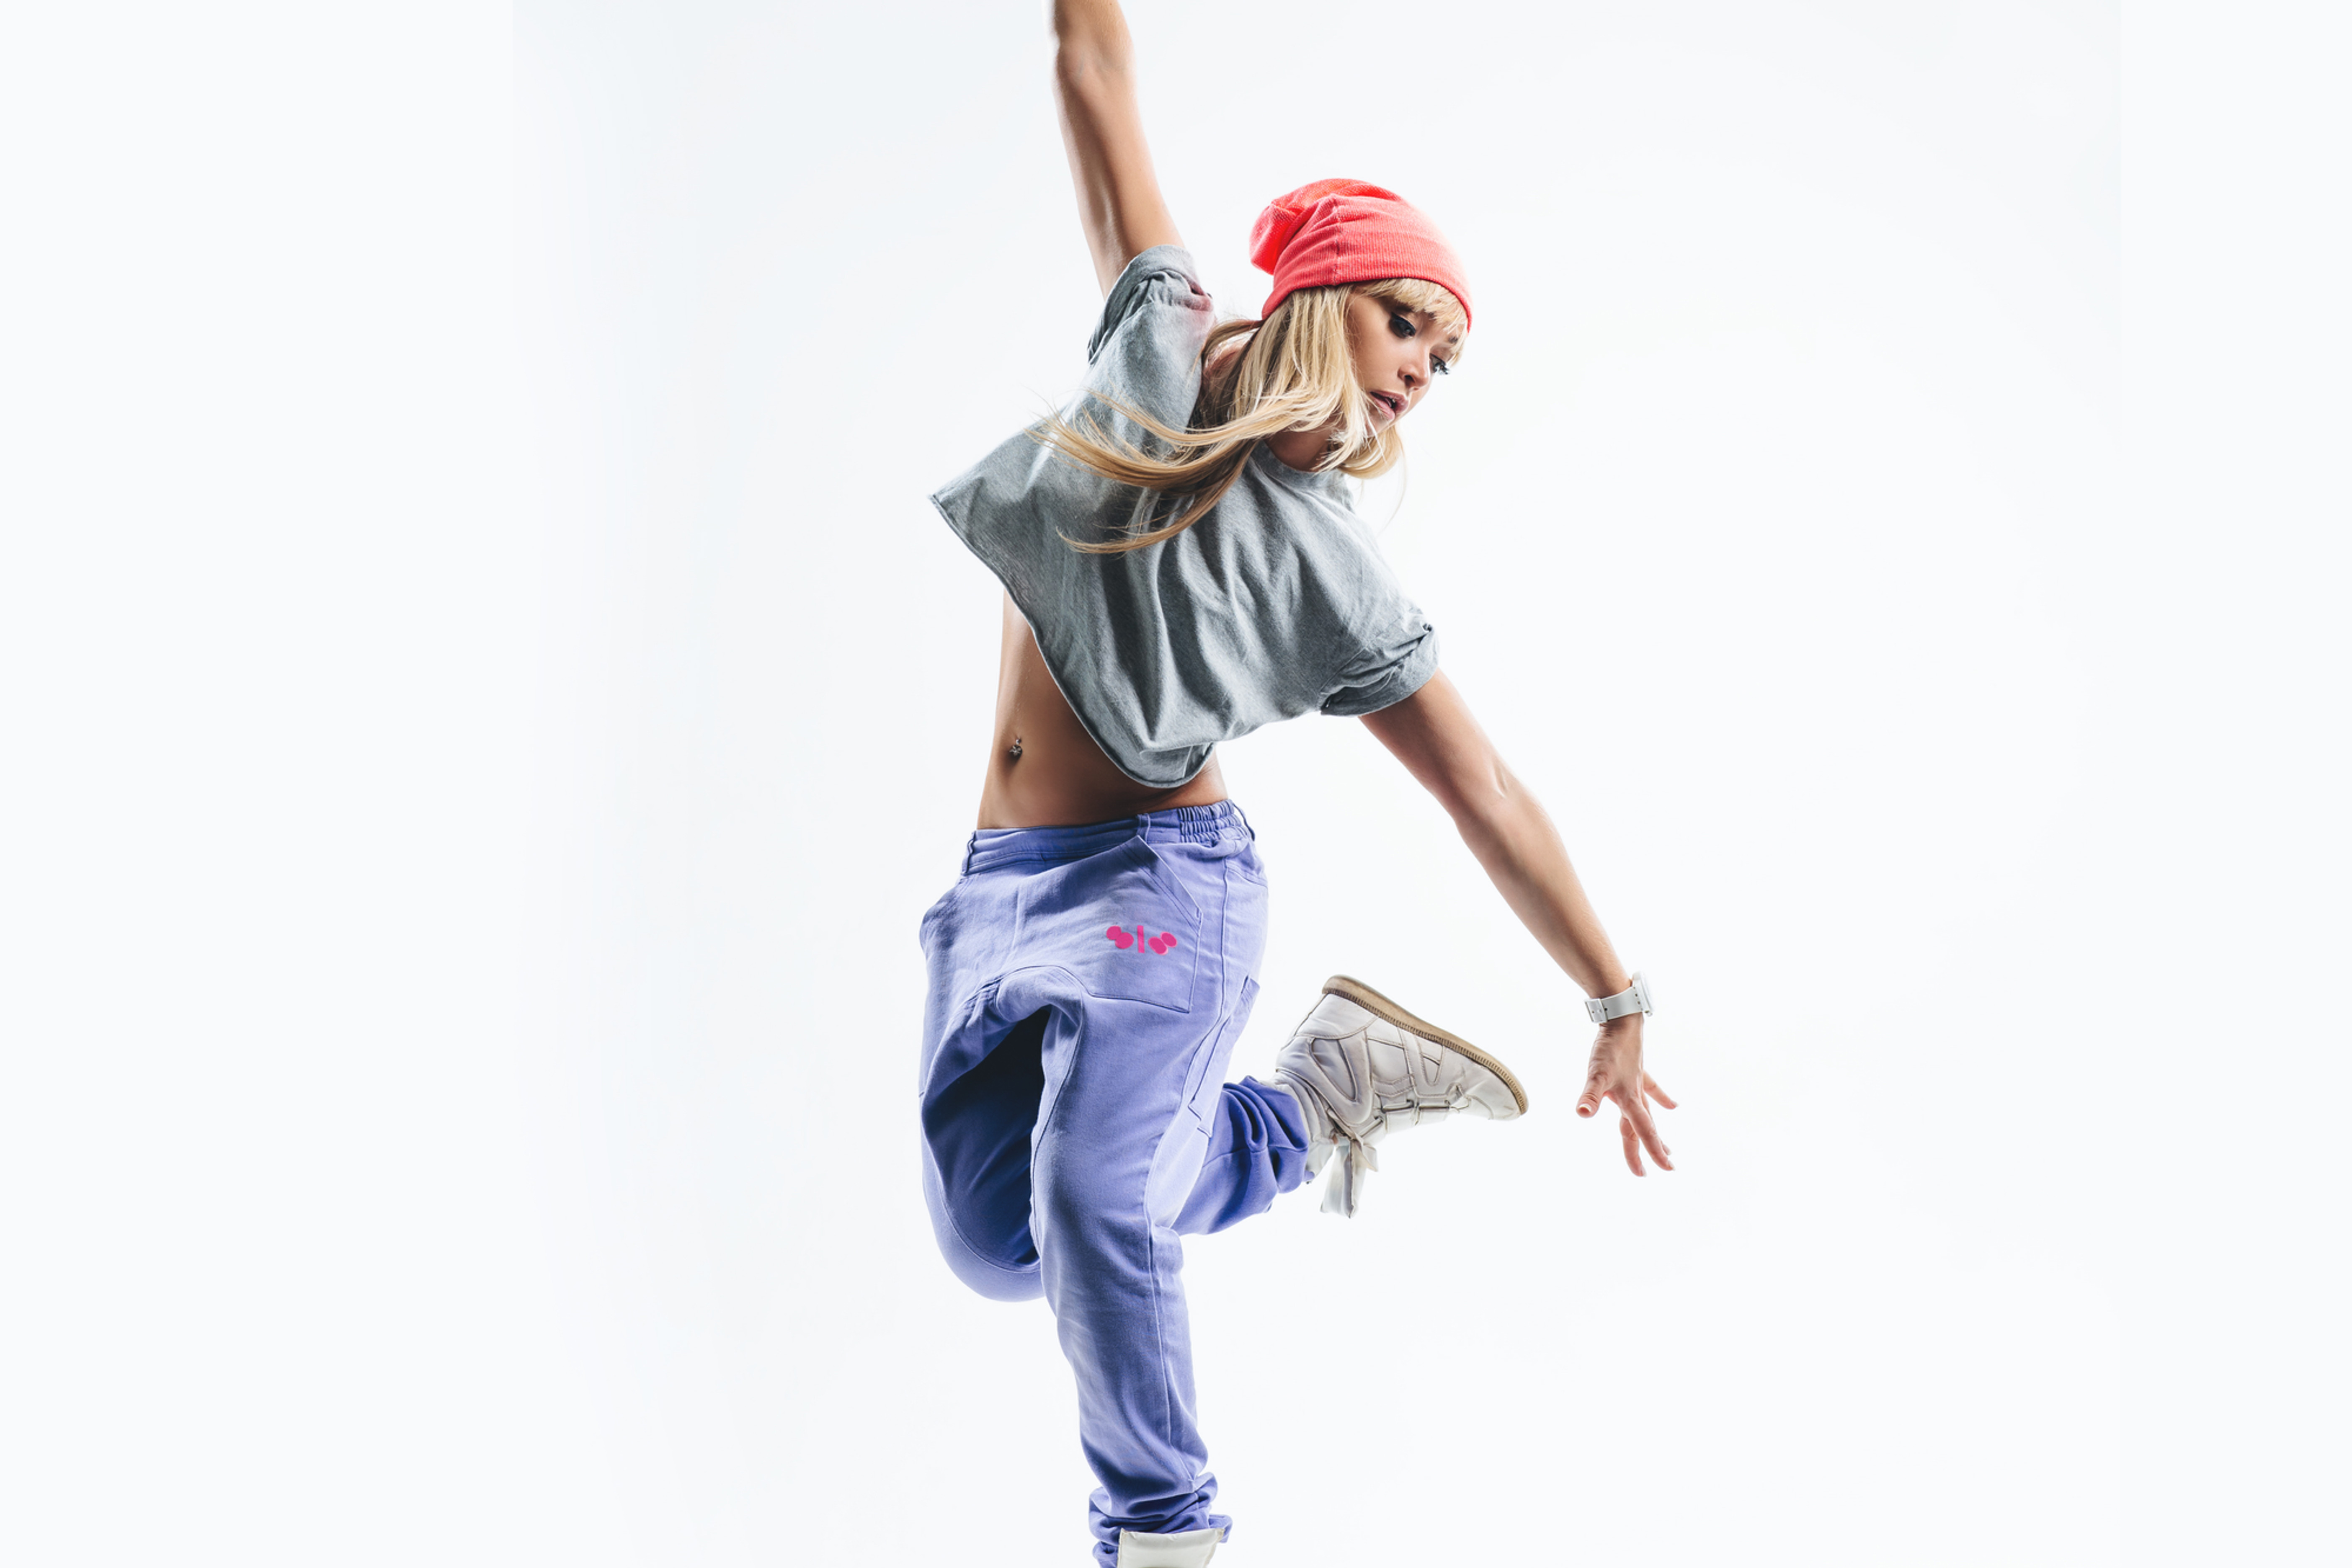 Zumba/Dance Fitness Instructor